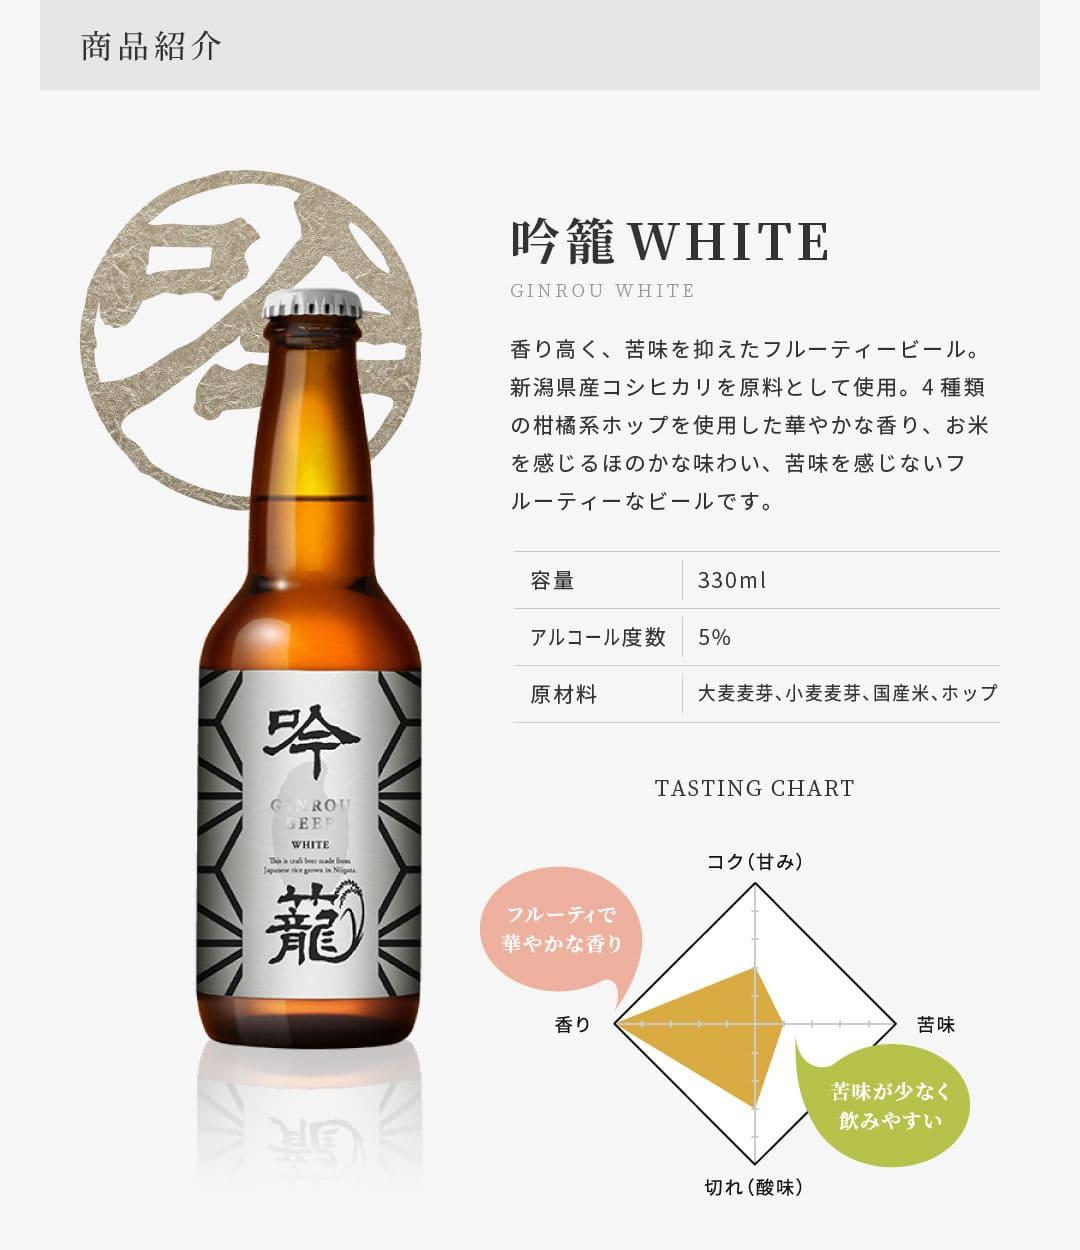 吟米WHITE